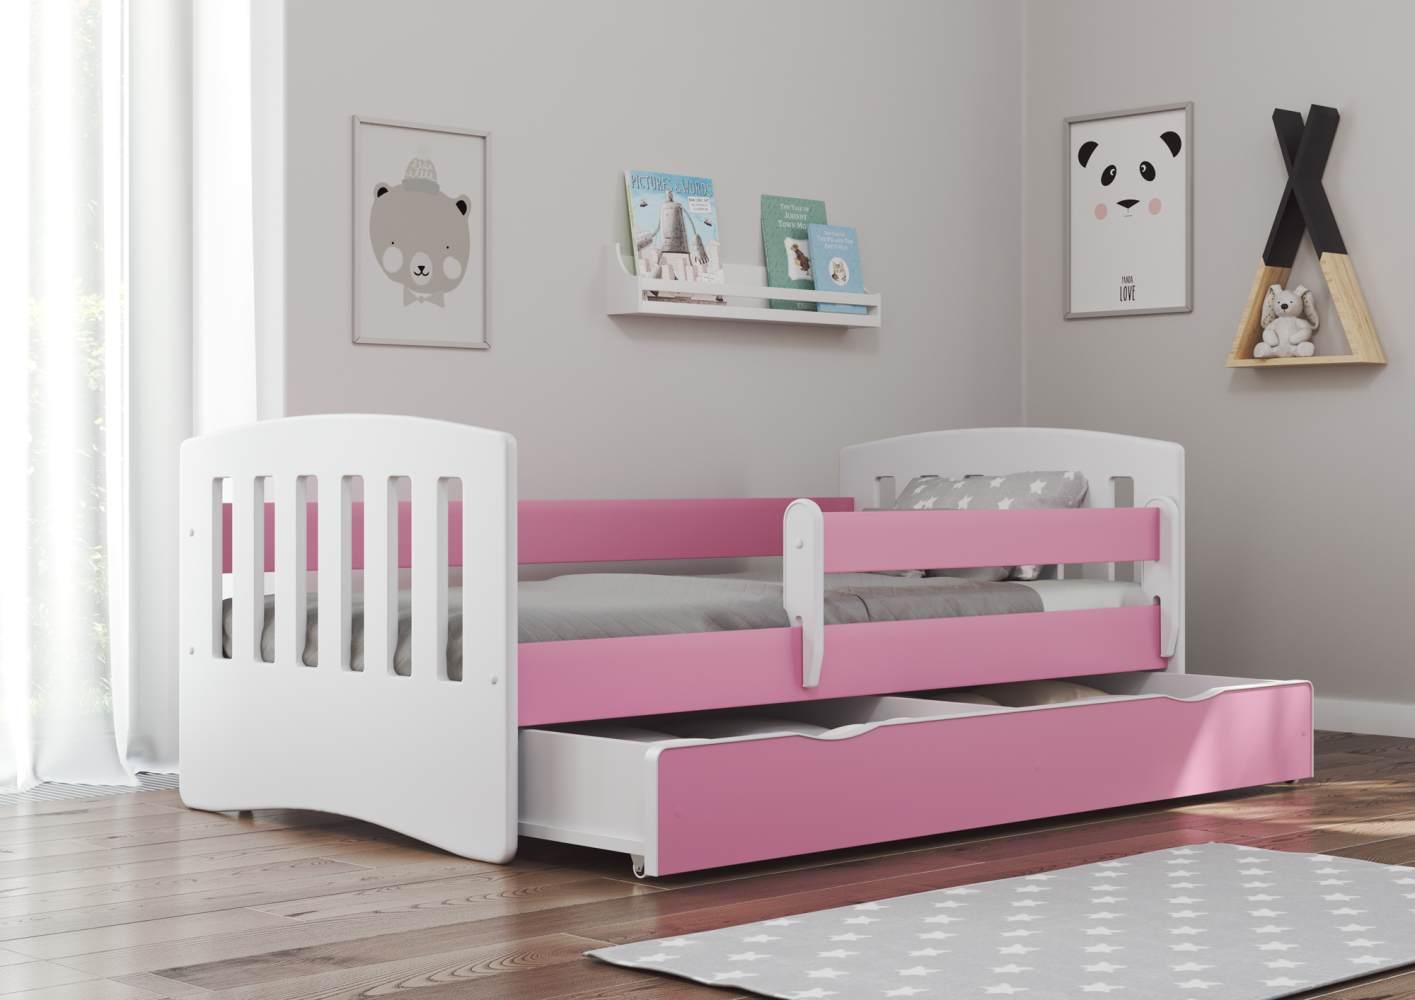 Bjird 'Classic' Kinderbett 80 x 140 cm, Rosa, inkl. Rausfallschutz, Lattenrost und Bettschublade Bild 1